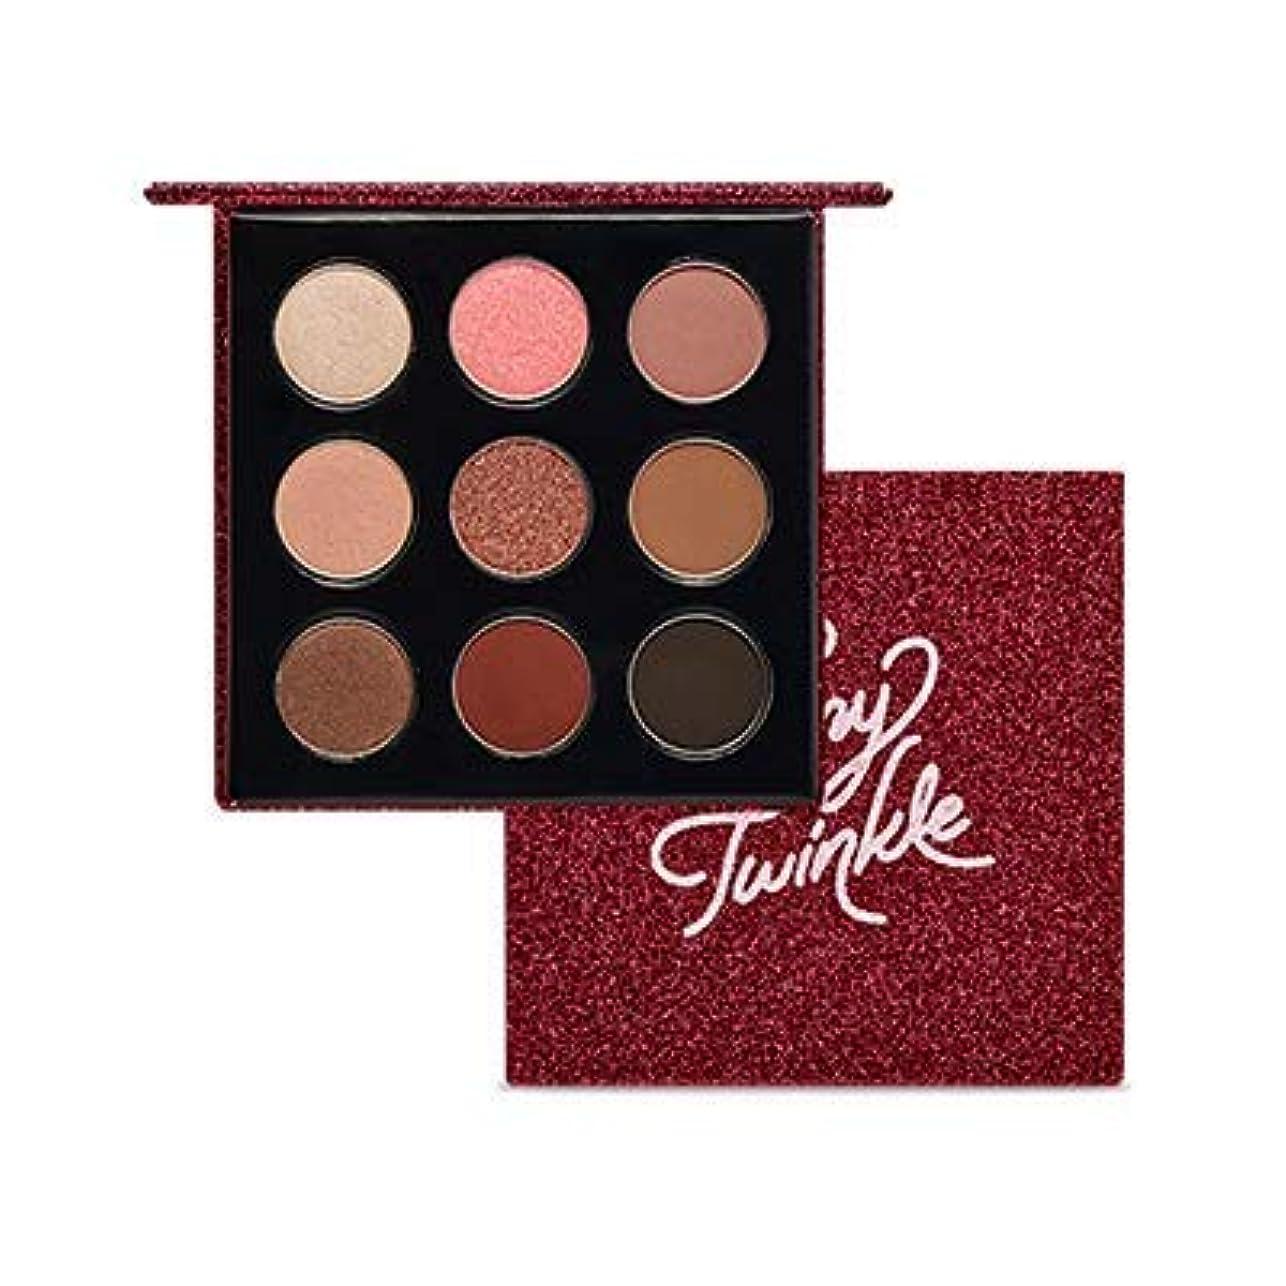 ETUDE HOUSE 【Holiday】 Tiny Twinkle Color Eyes #01 Rose Gold Ornament エチュードハウス タイニー トゥインクル カラー アイズ #01 ローズゴールド...